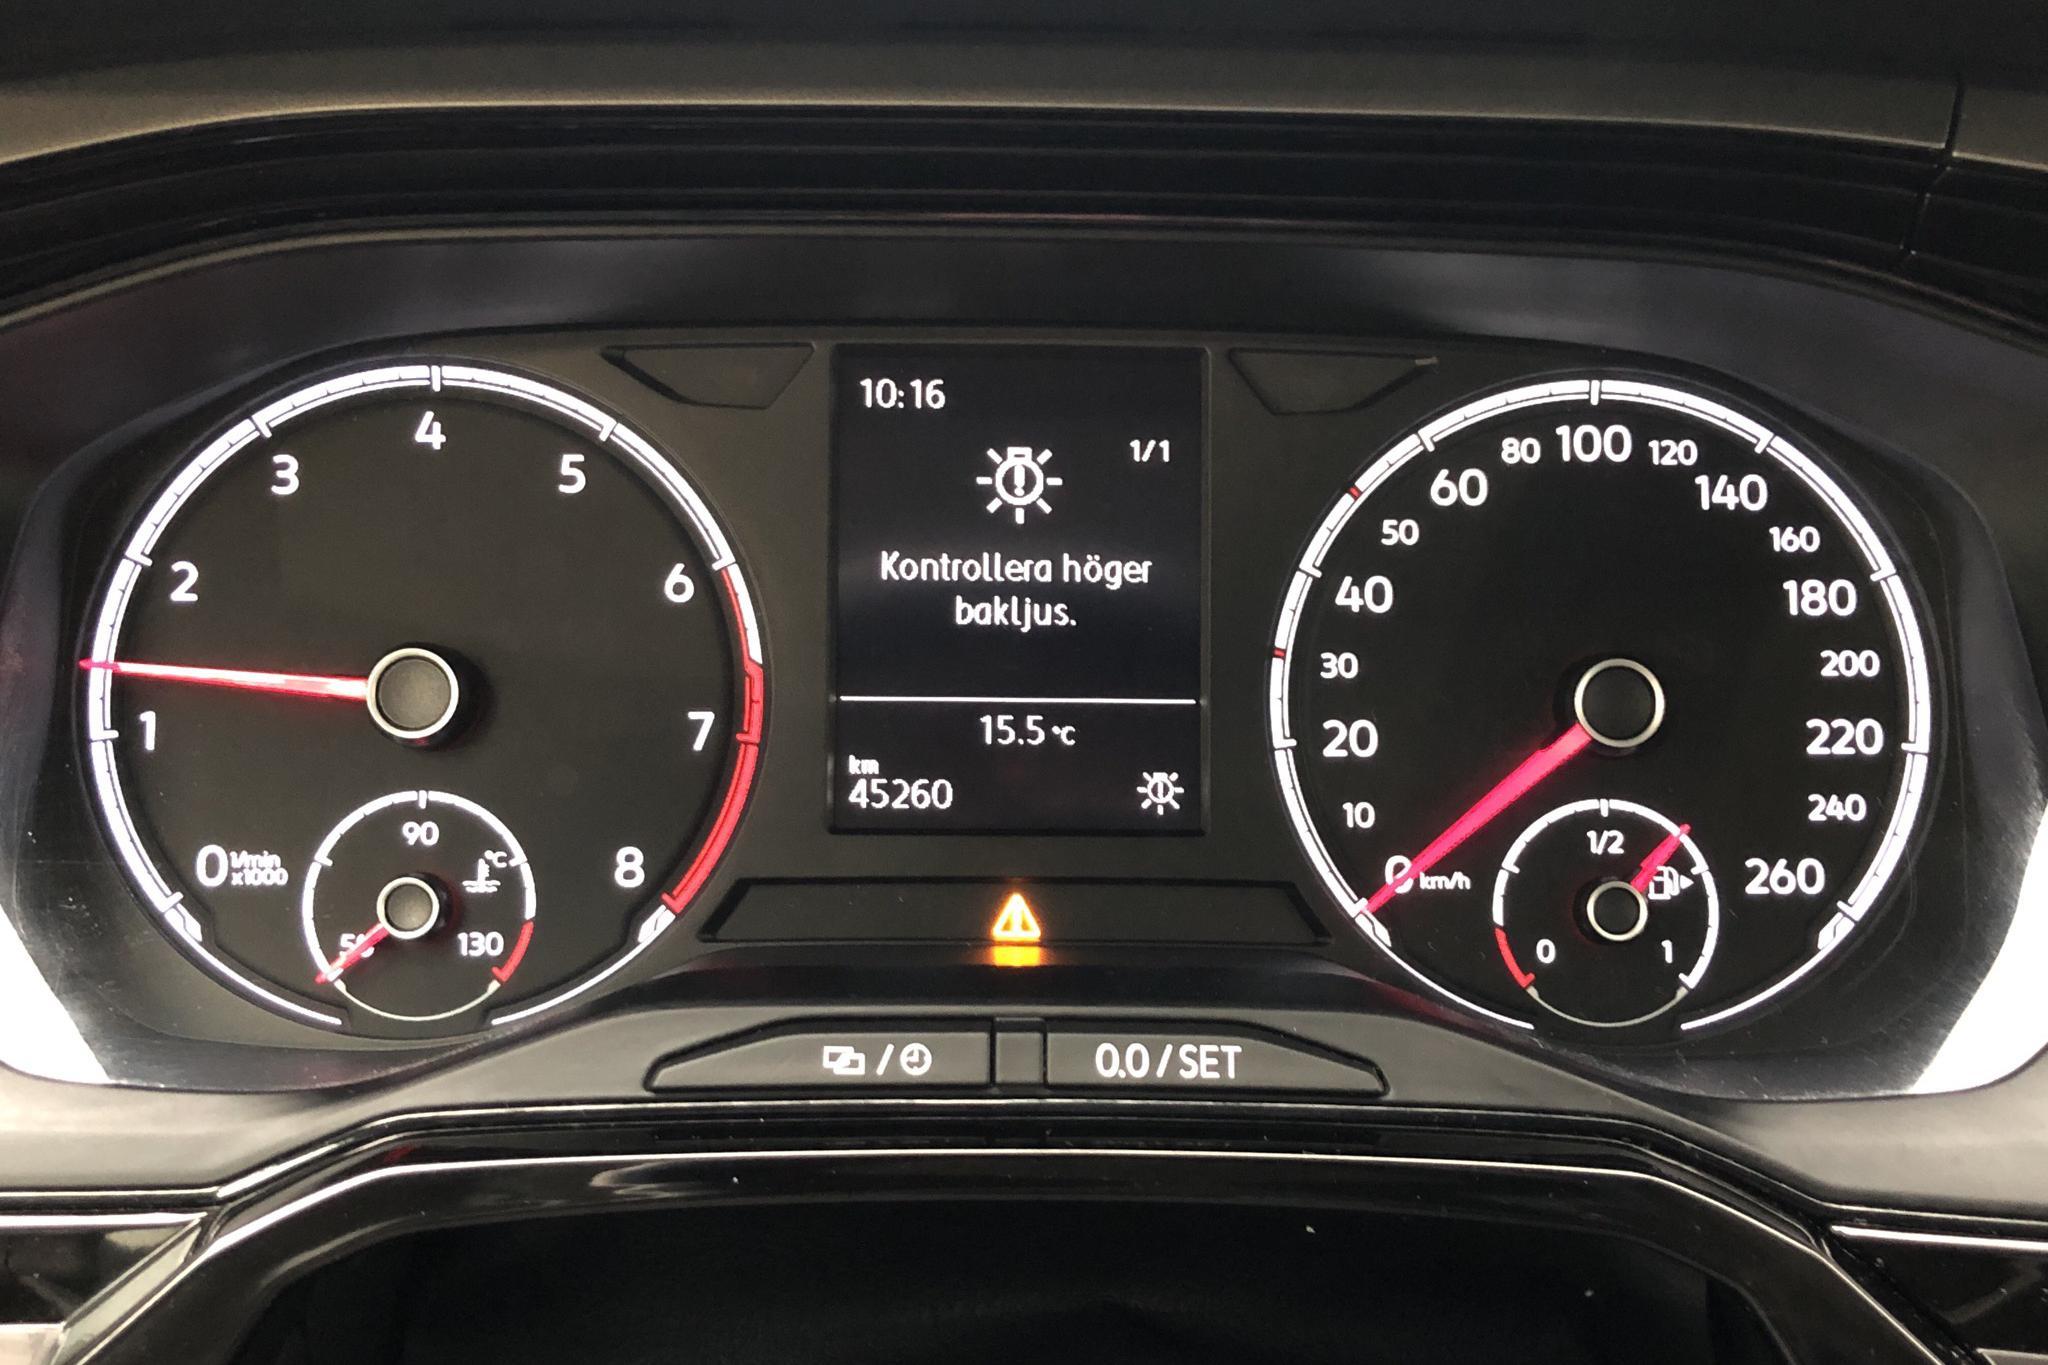 VW Polo 1.0 TSI 5dr (95hk) - 4 526 mil - Manuell - vit - 2019